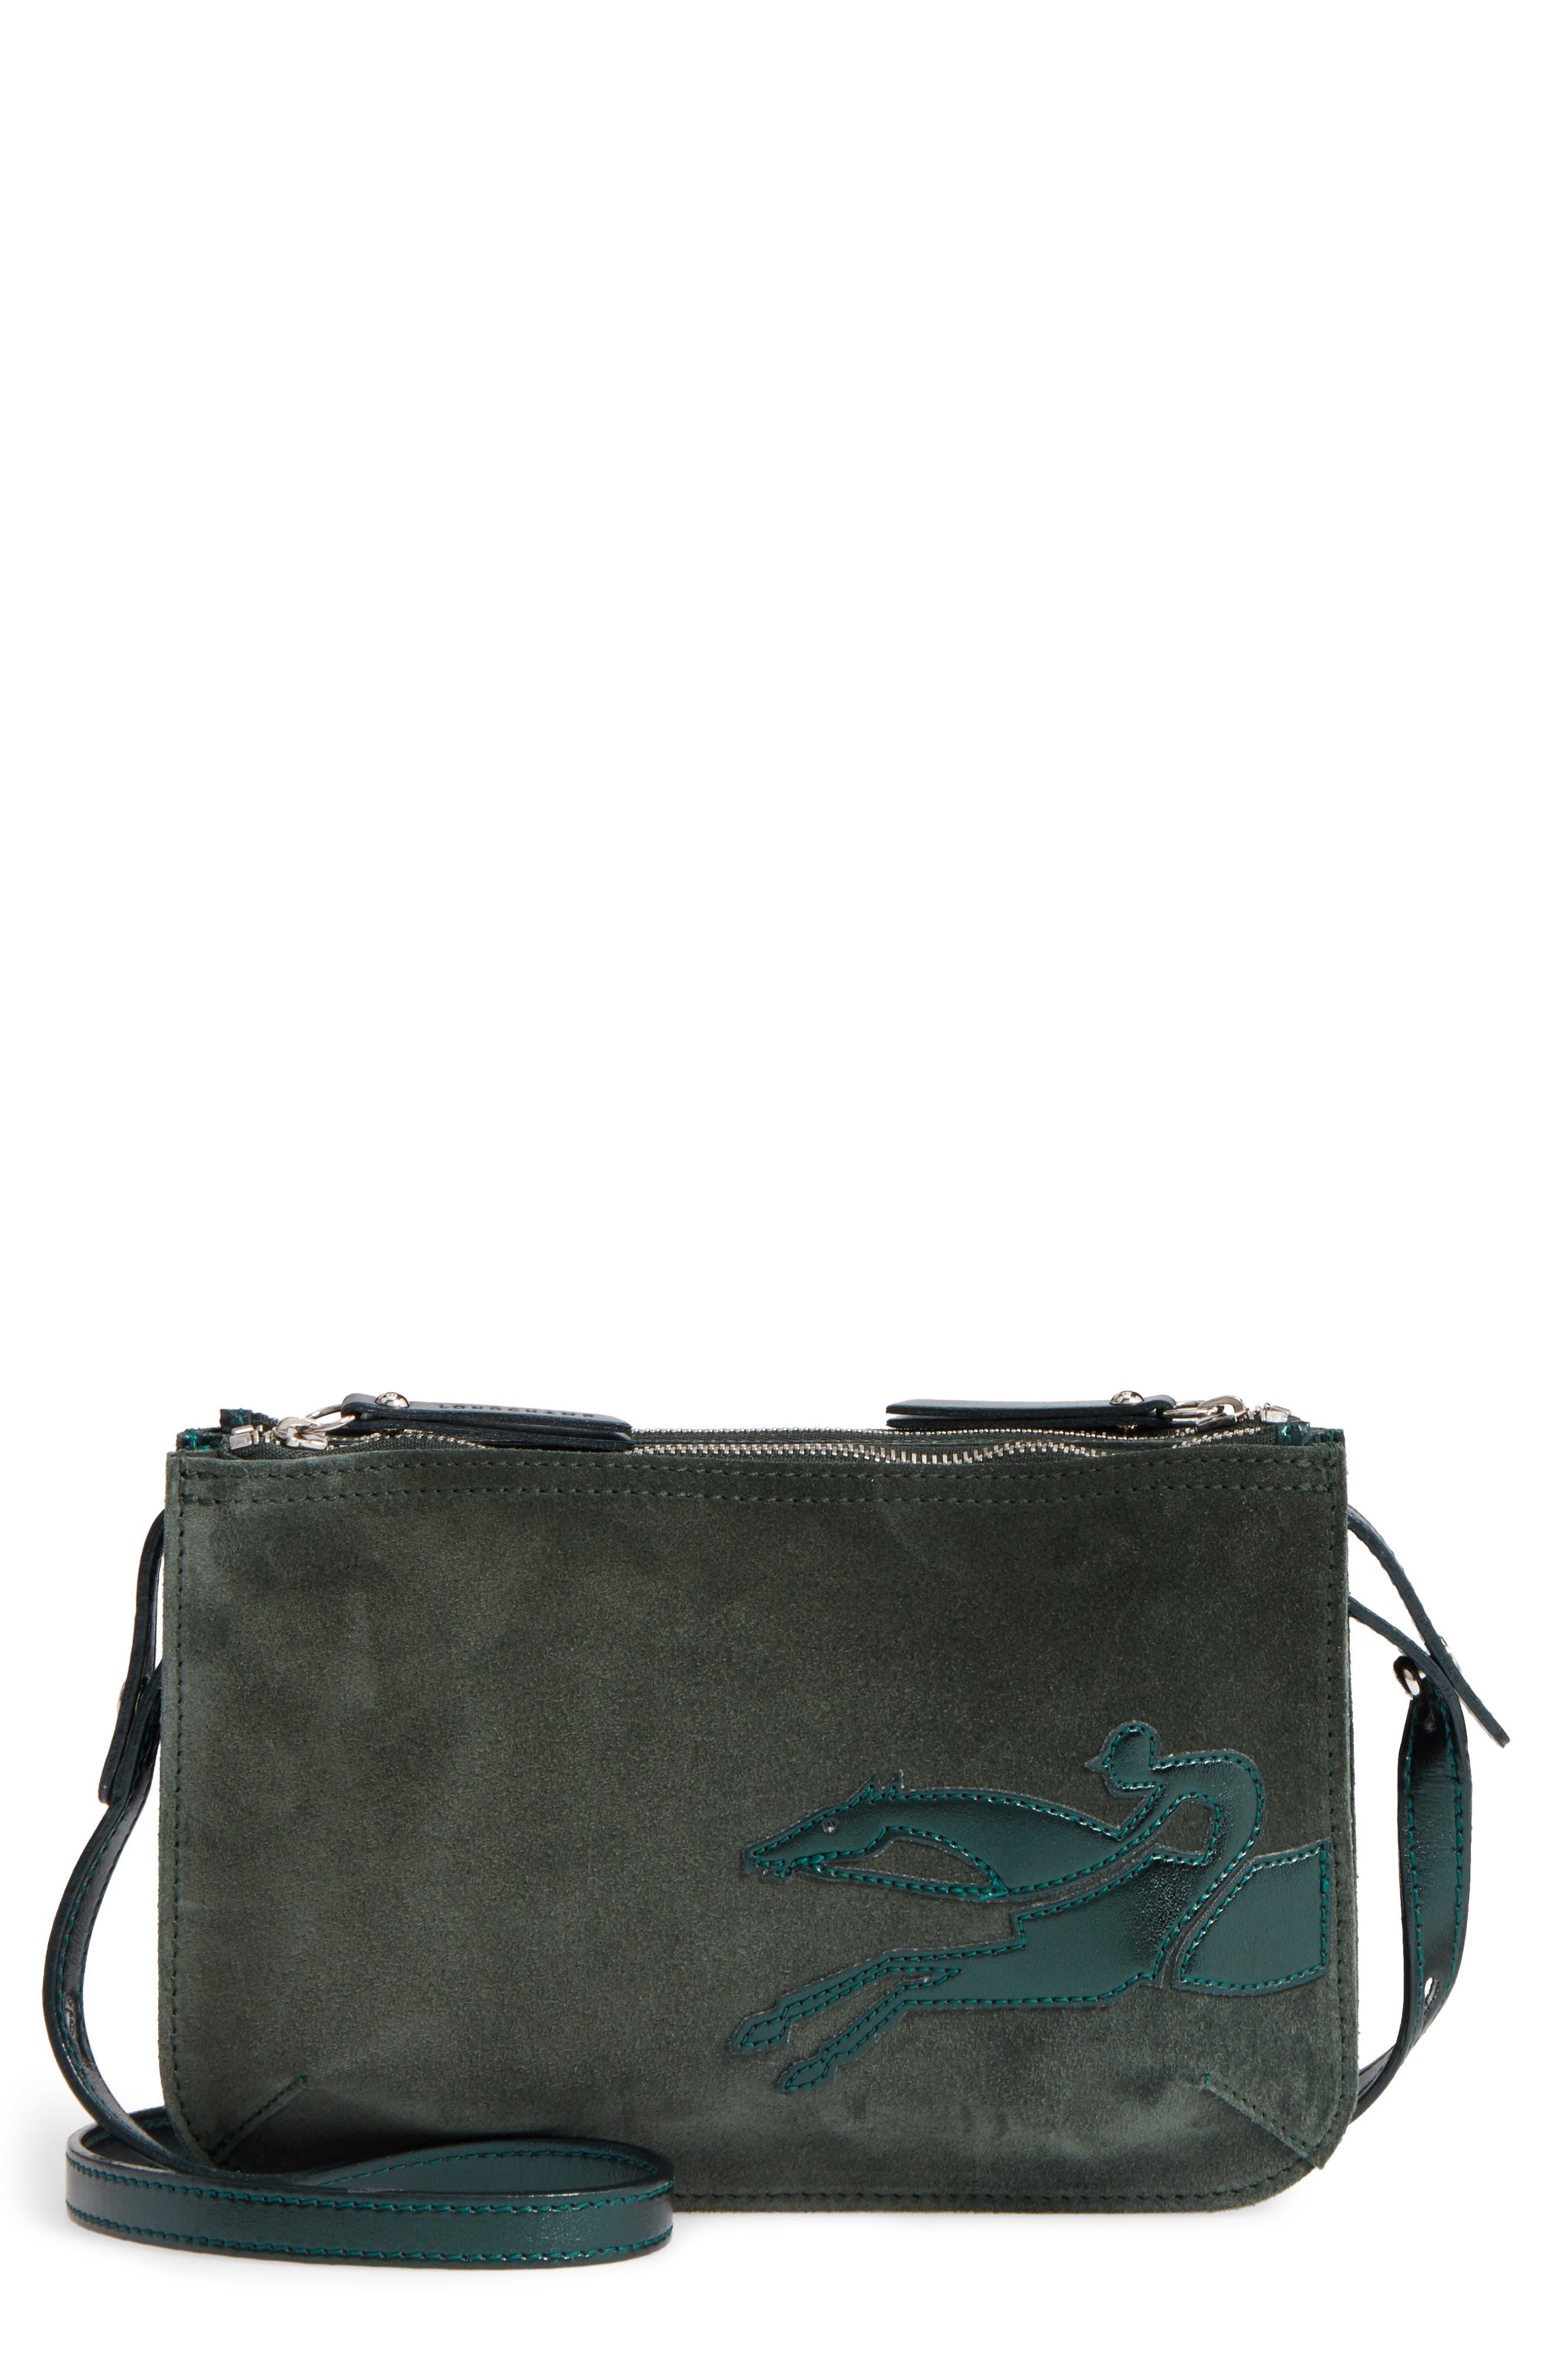 Main Image - Longchamp Shop It Crossbody Bag